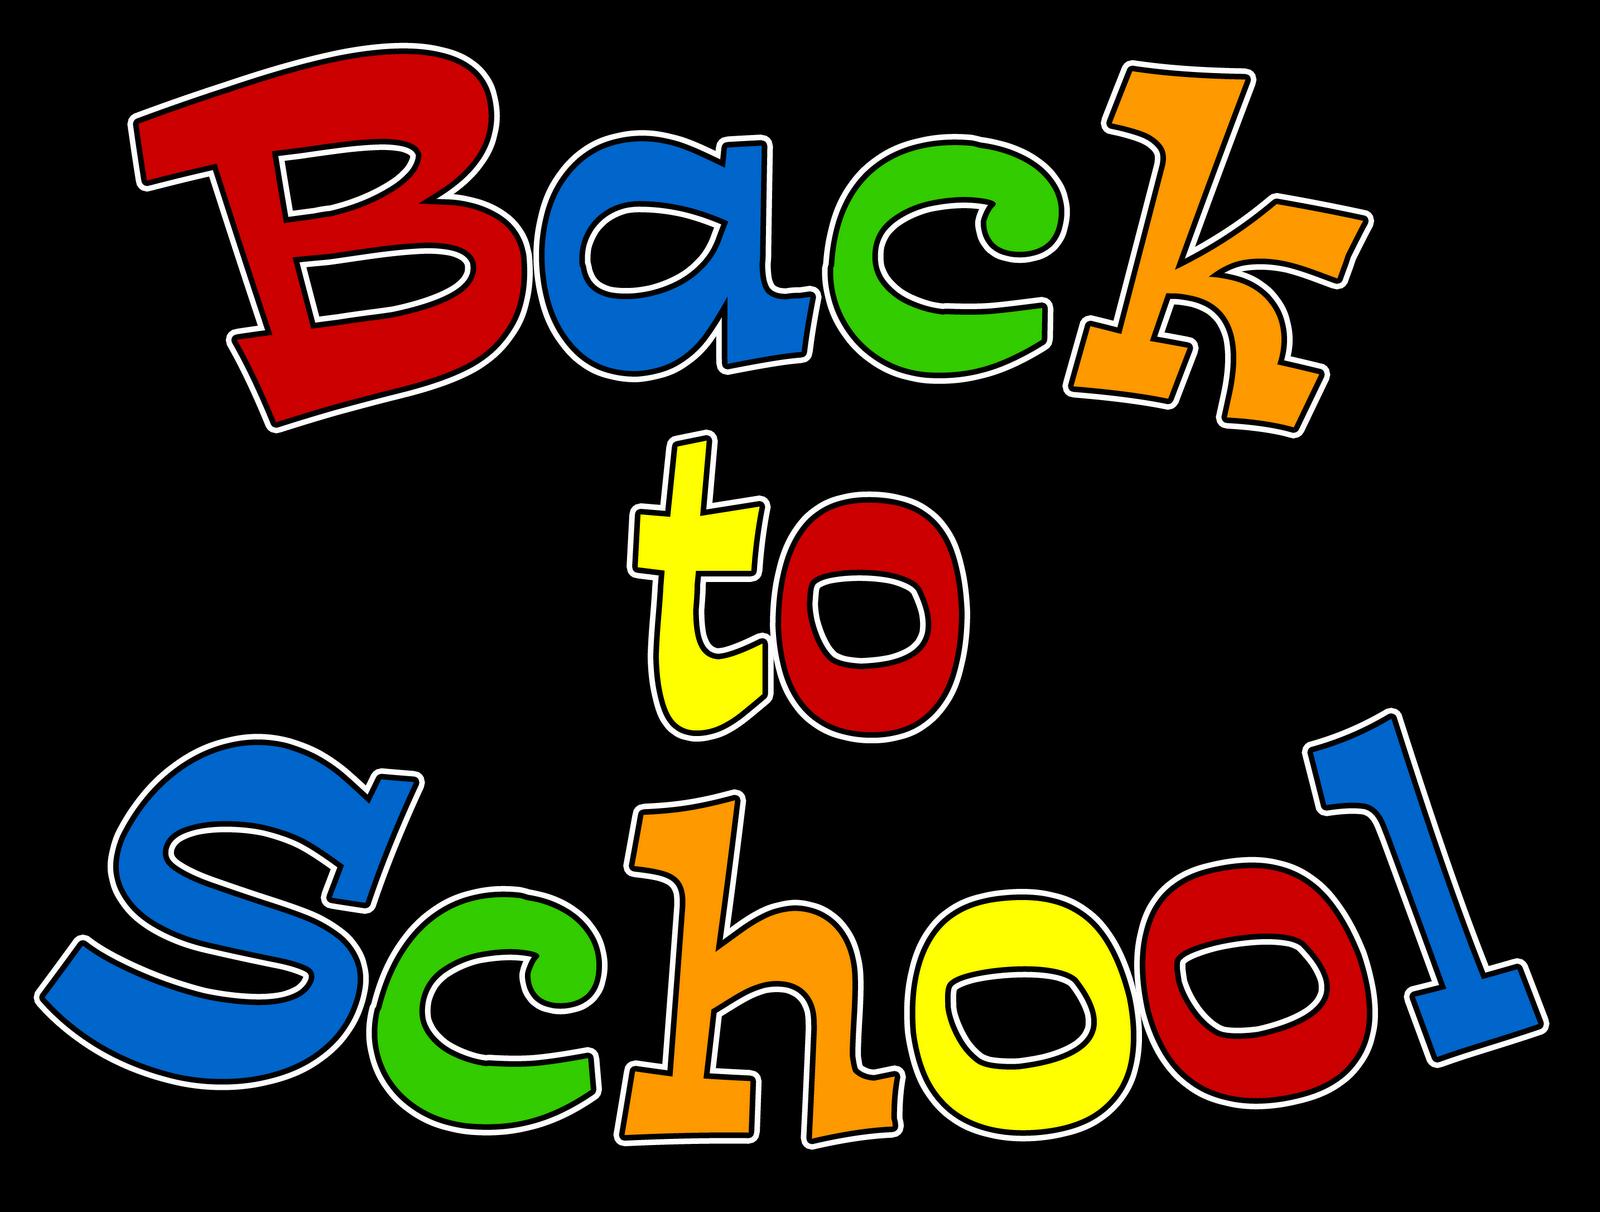 Back to school school clipart education clip art school clip art 2